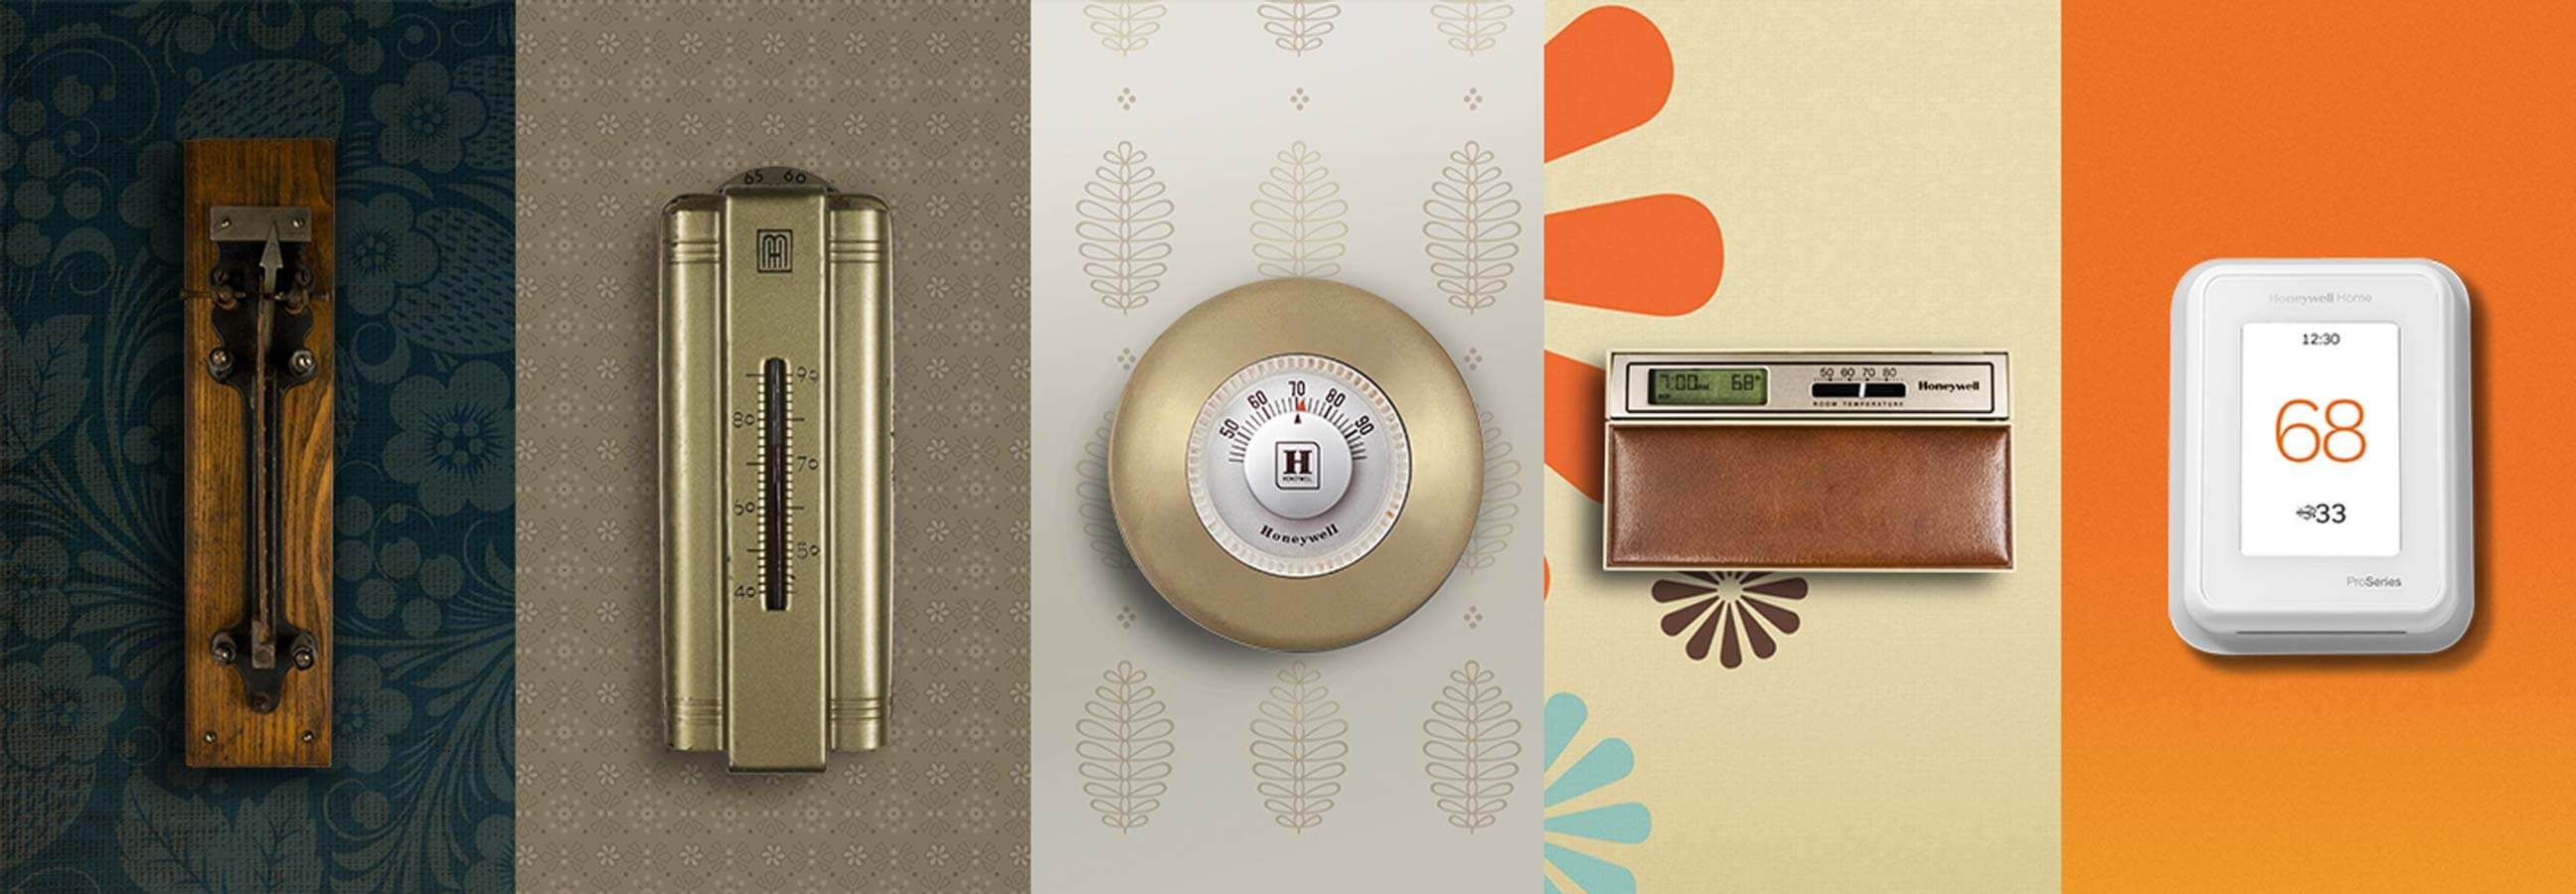 WhoWeAre_thermostat-timeline-min-1